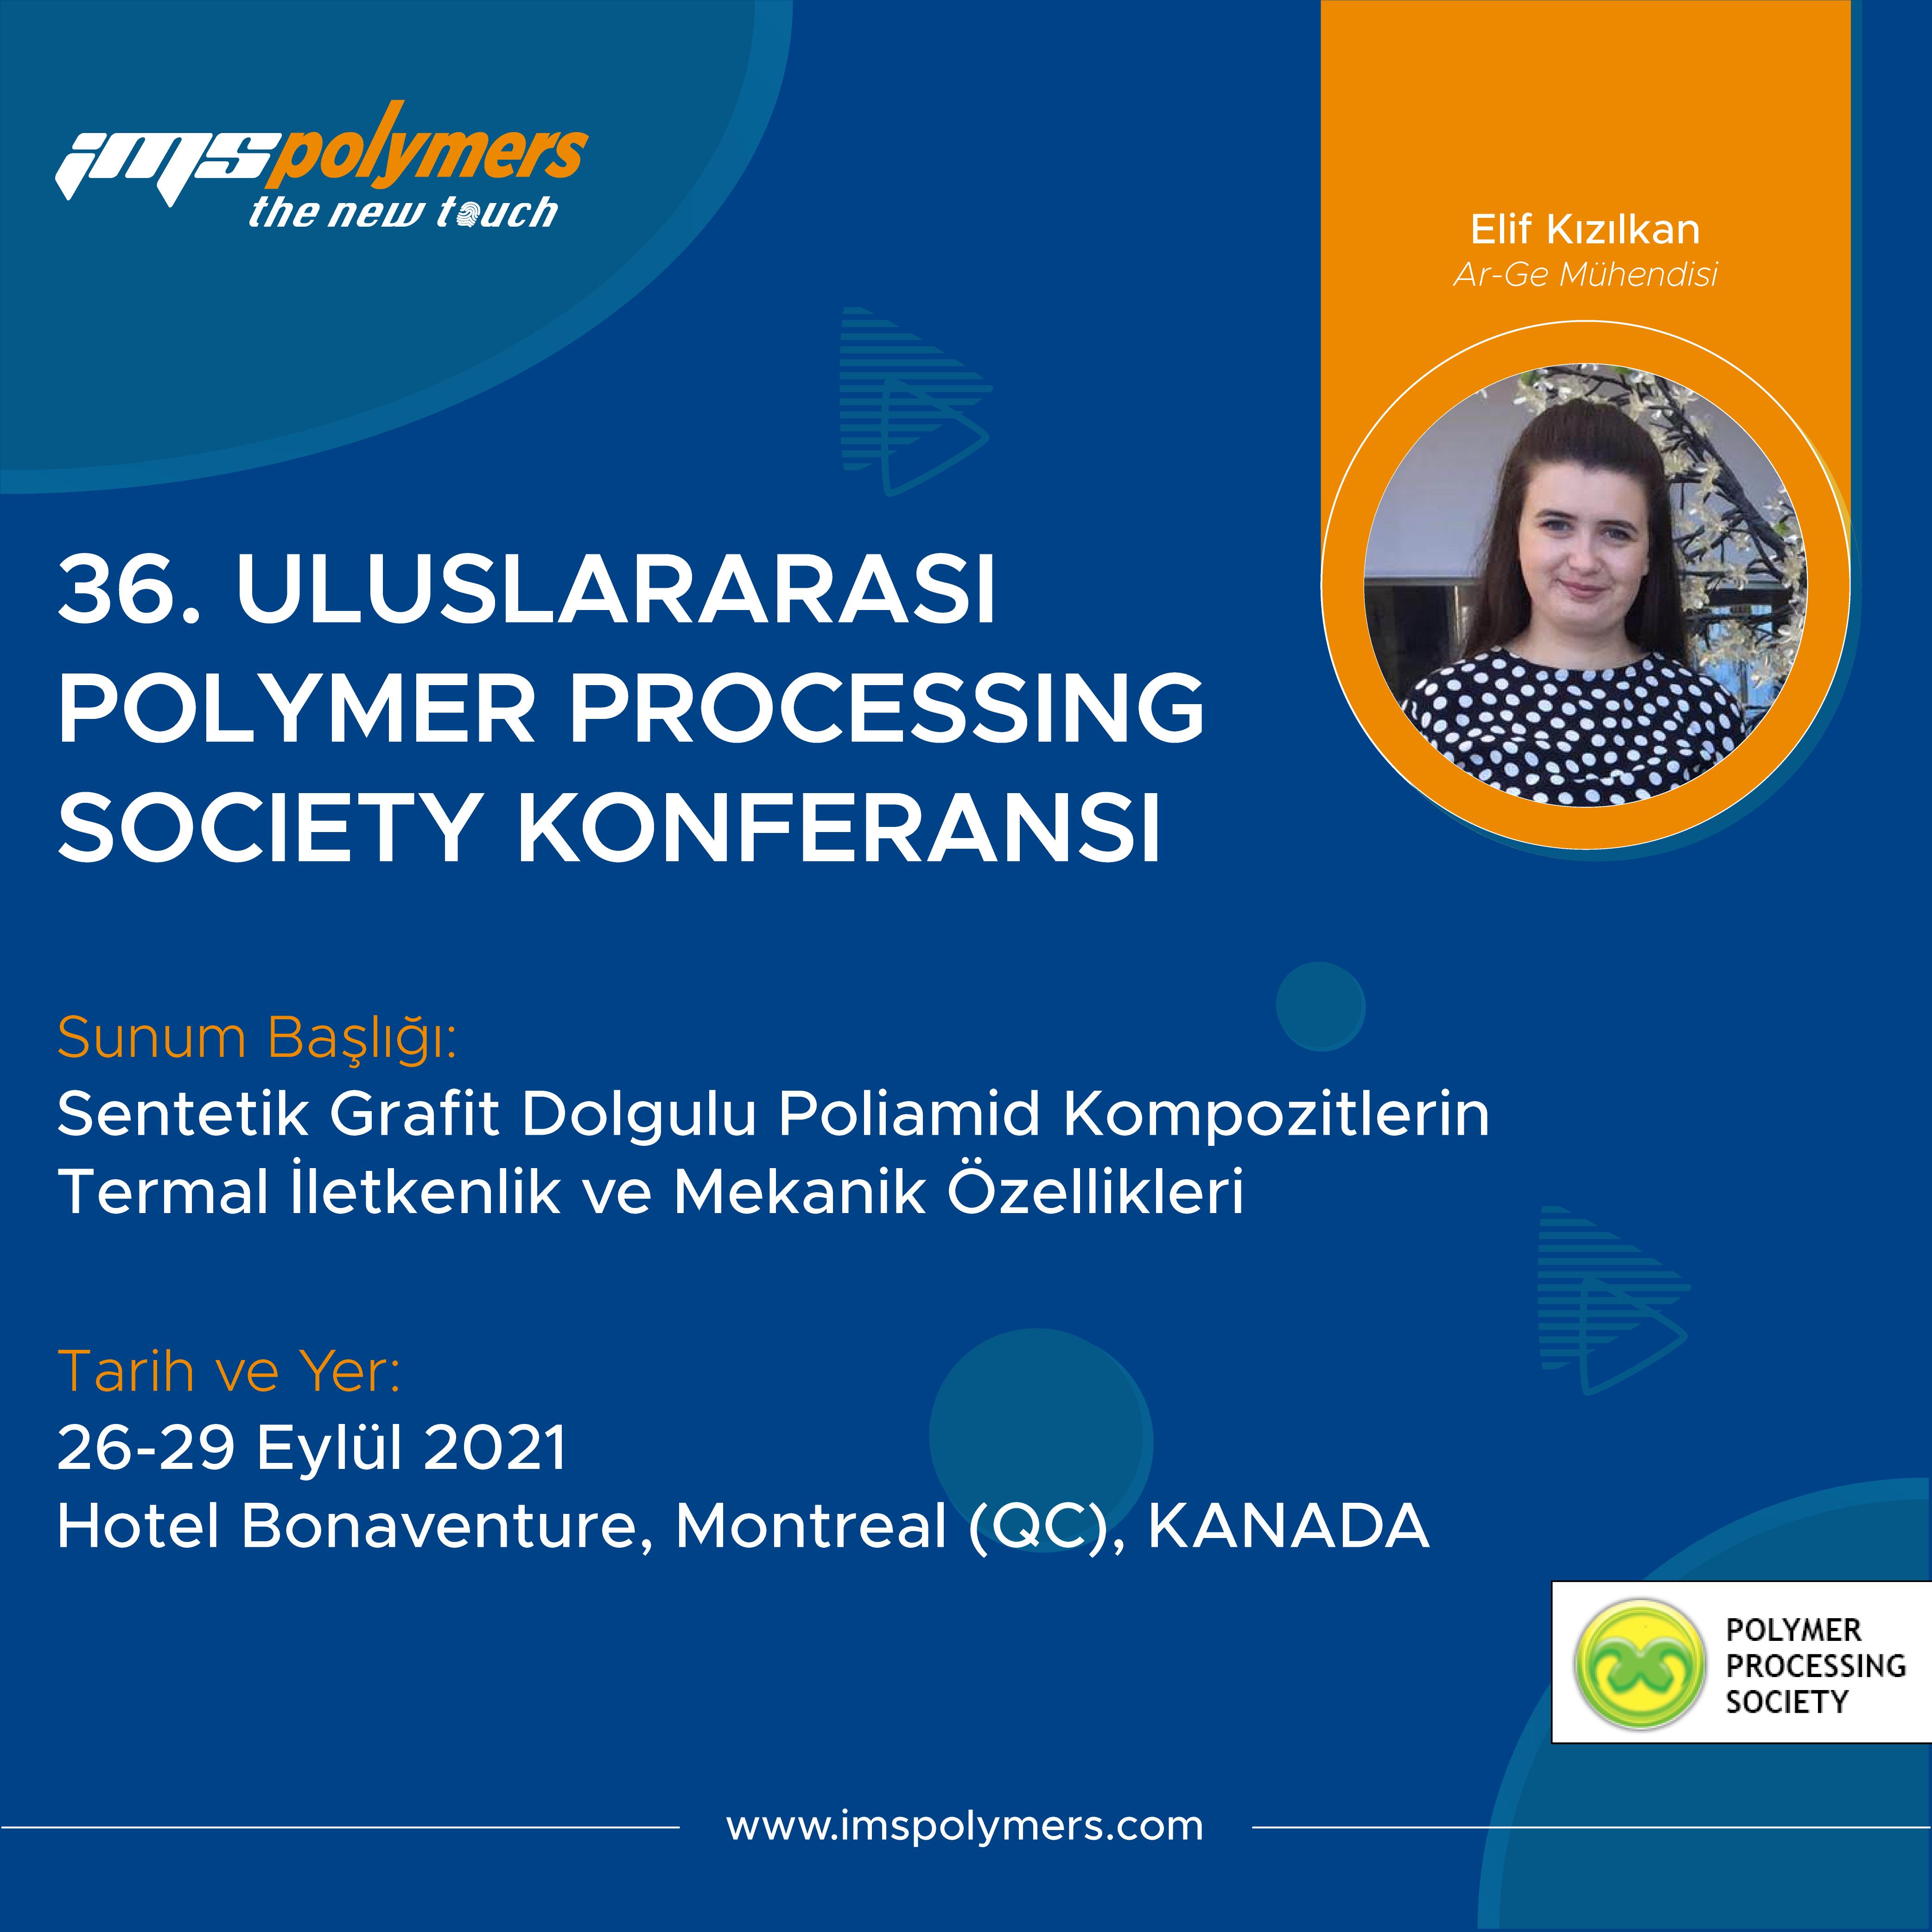 36. Uluslararası Polymer Processing Society Konferansı'na Katılıyoruz